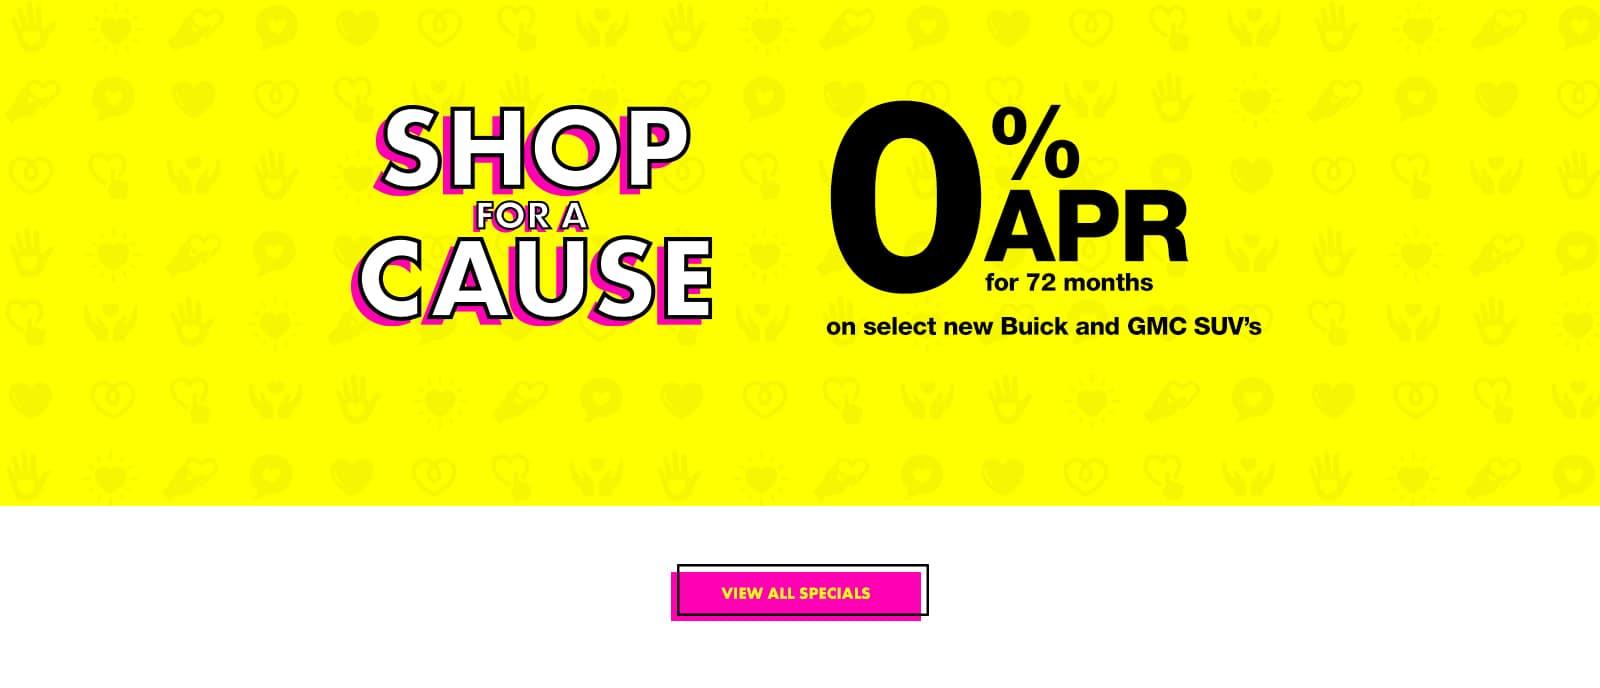 210607-BGR-FeatureSlide-ShopForACause-APR